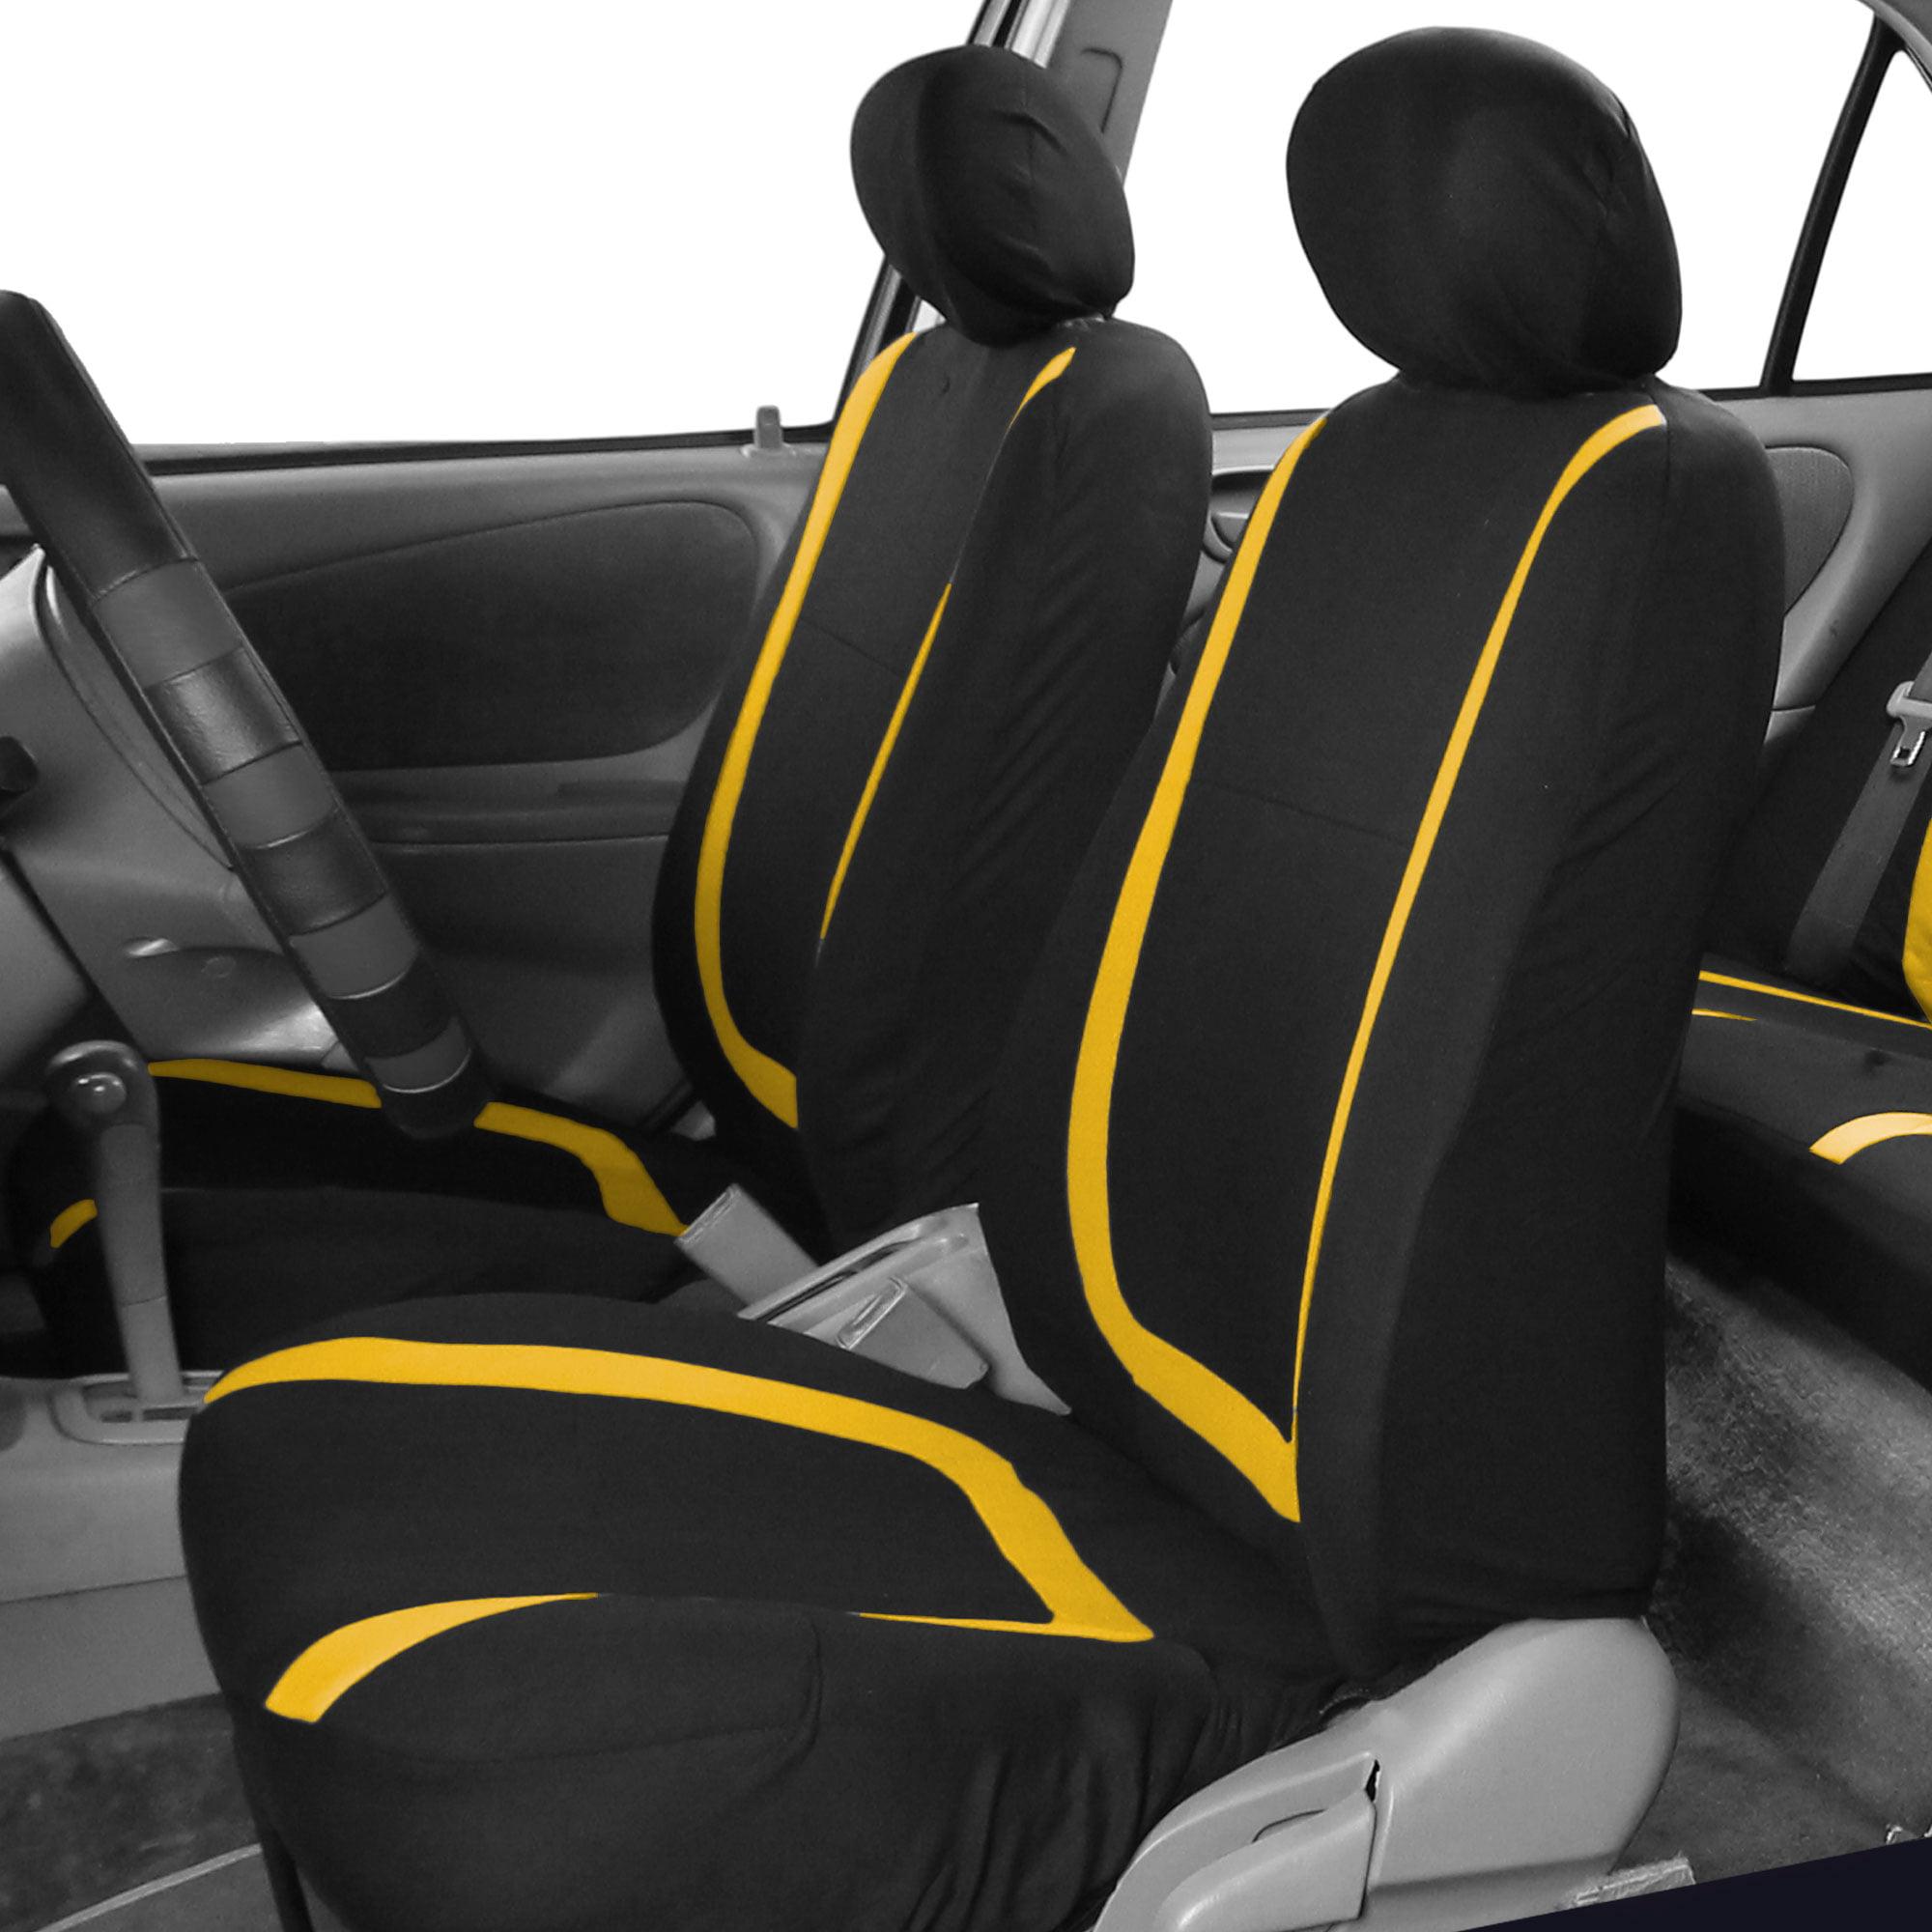 Prime Fh Group Unique Flat Cltoh Front Bucket Car Seat Covers For Sedan Suv Tuck Van Two Front Buckets Black Yellow Walmart Com Lamtechconsult Wood Chair Design Ideas Lamtechconsultcom